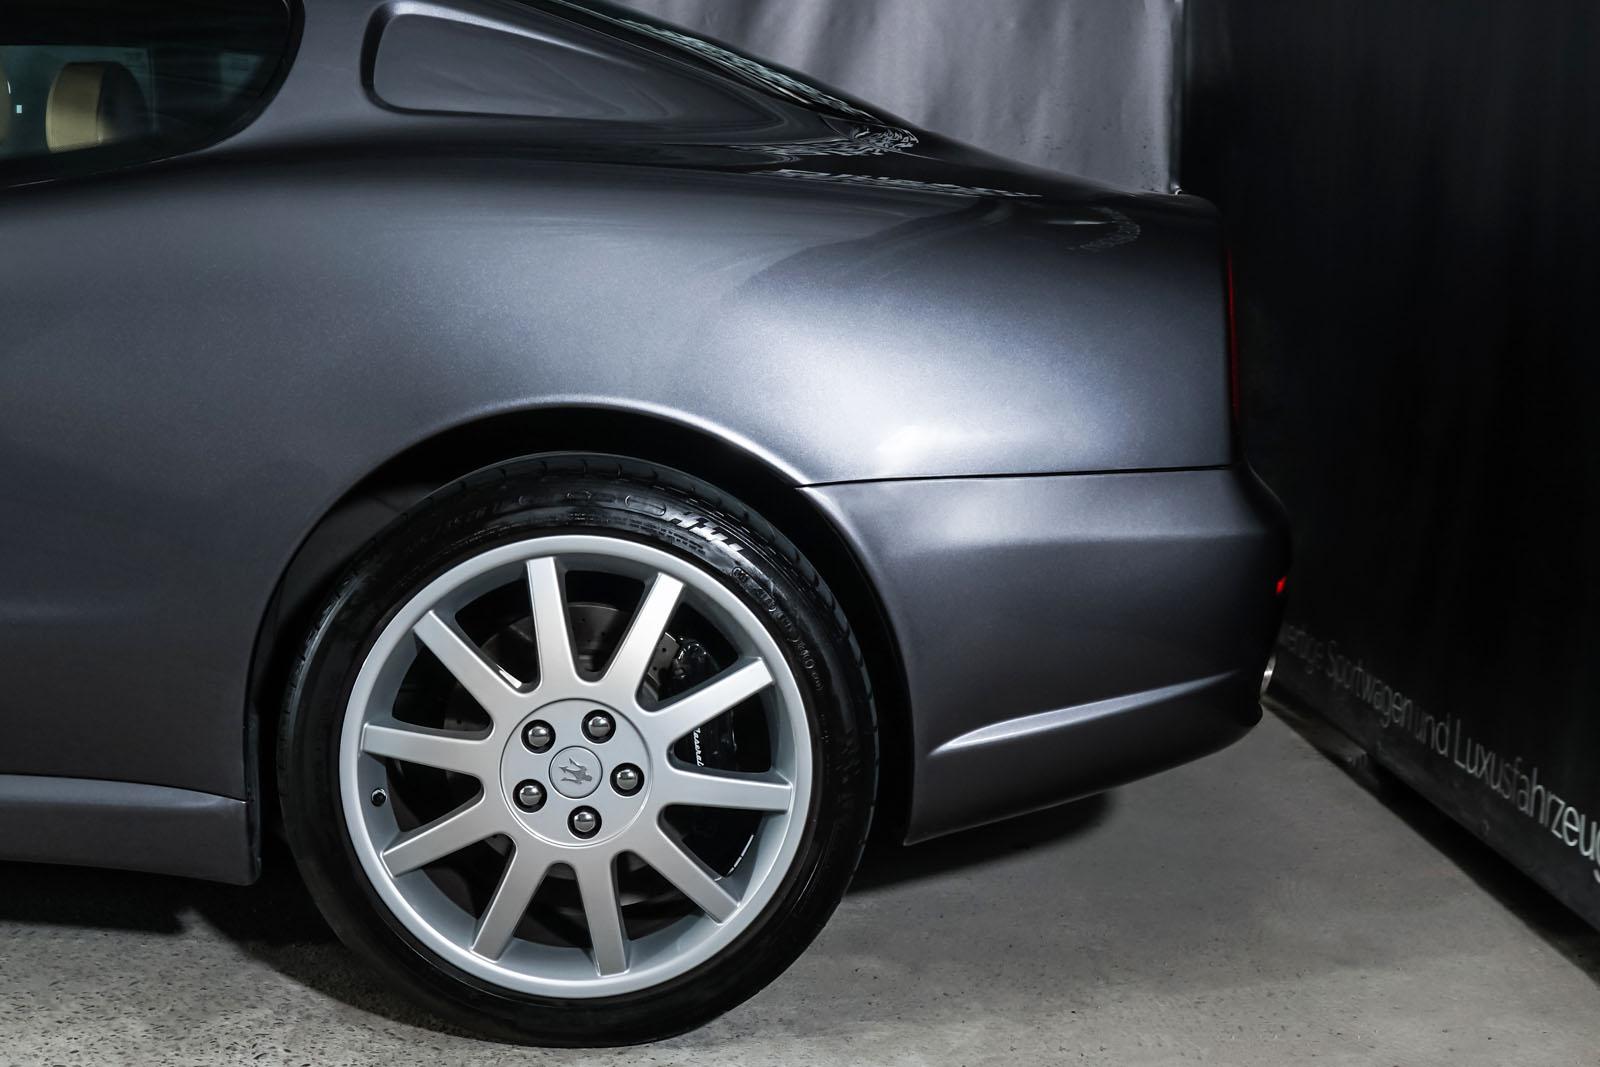 Maserati_3200_GTA_Grau_Beige_MAS-0874_4_w